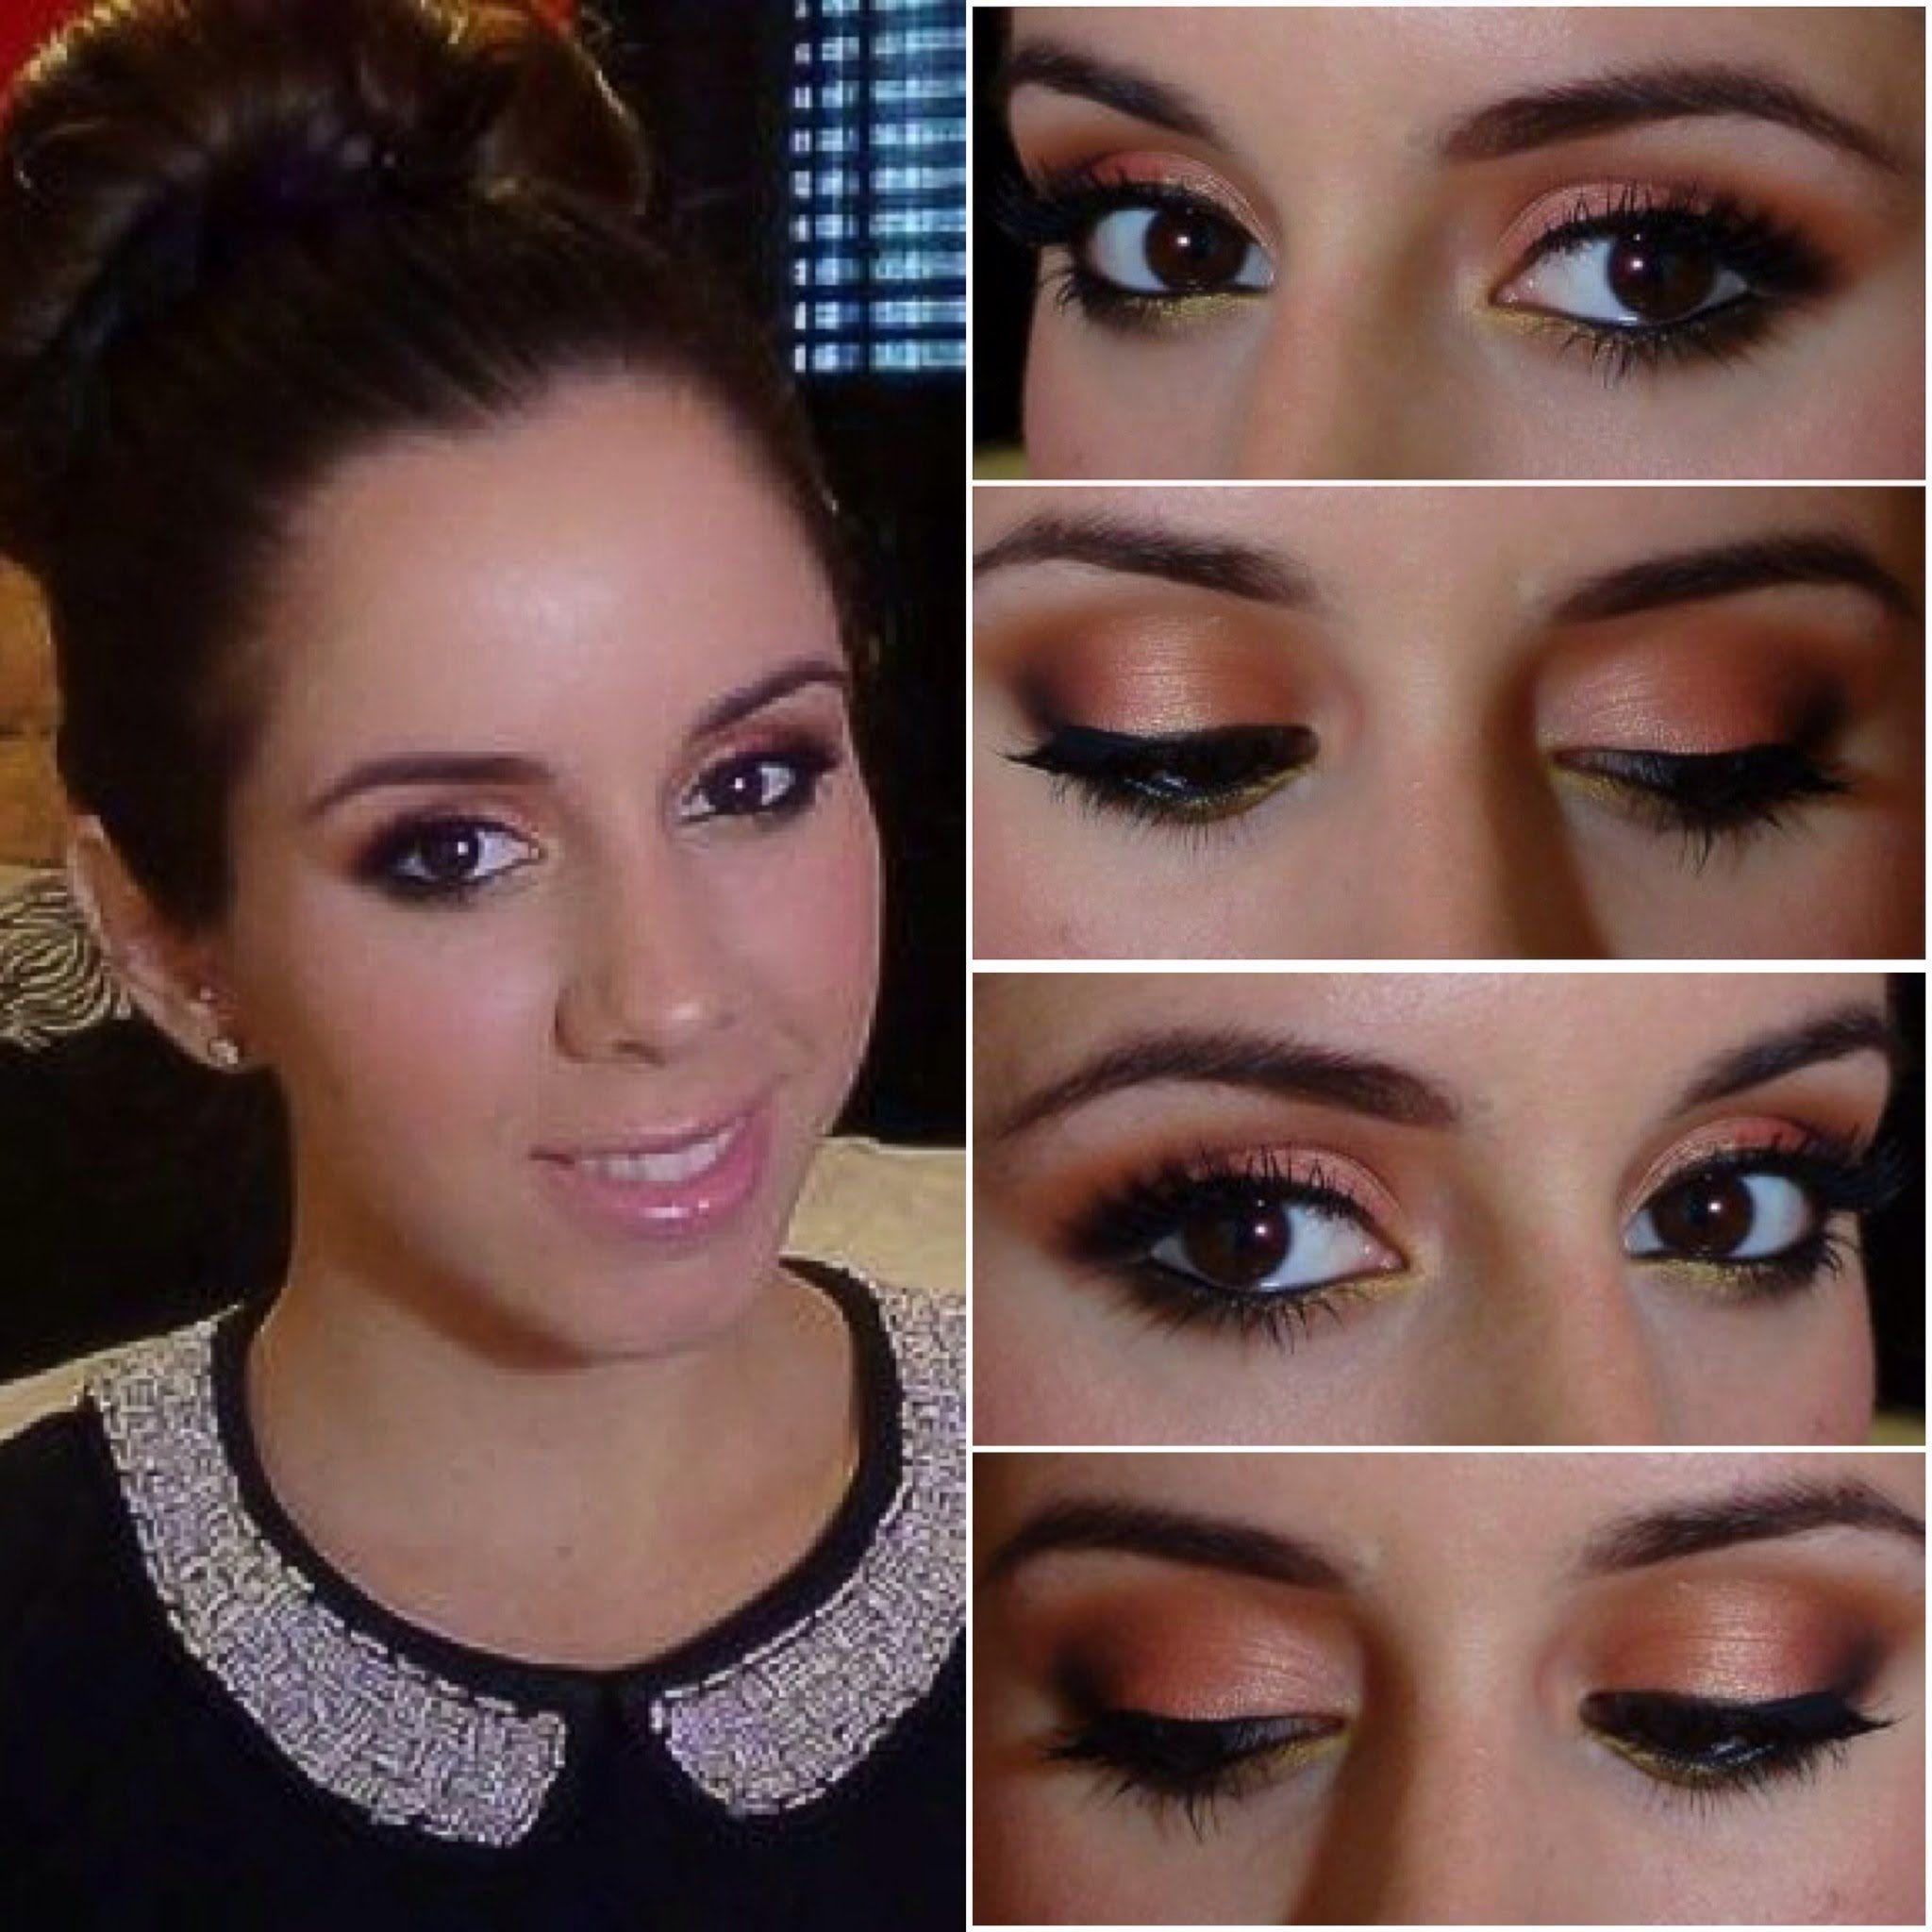 makeup for black prom dress - Google Search | makeup♡ | Pinterest ...